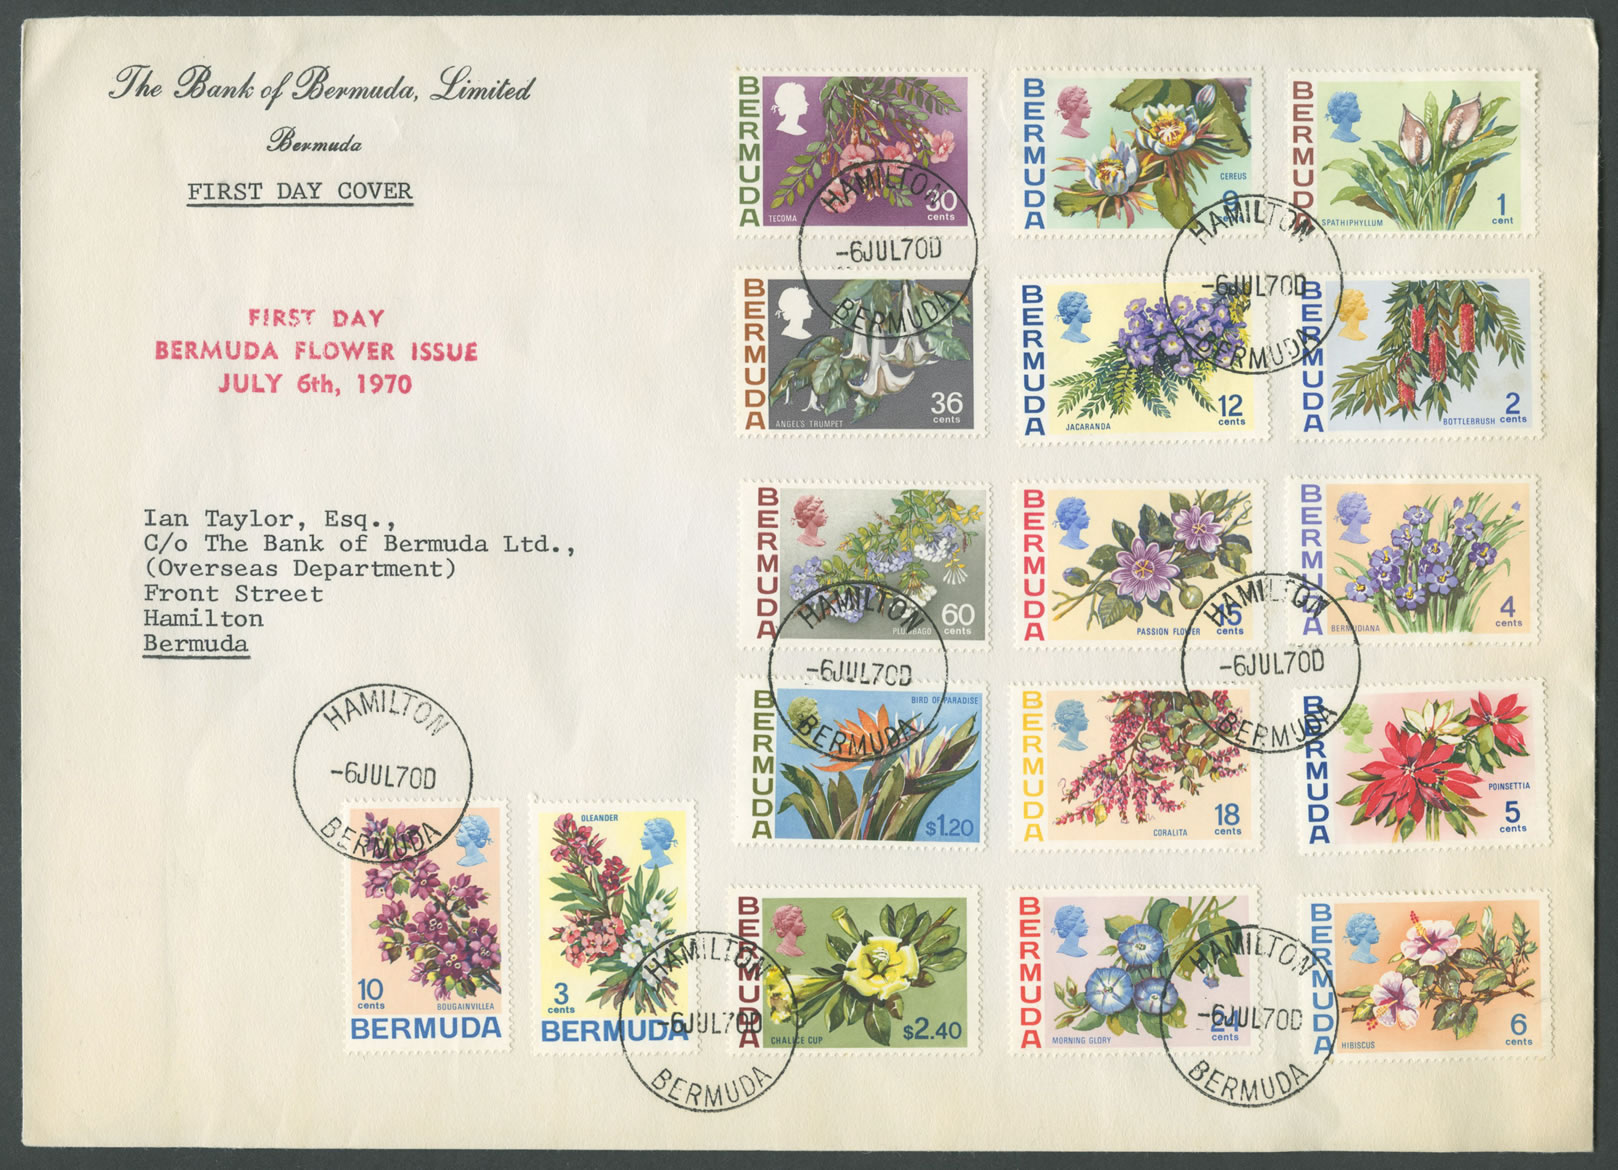 1970 Bermuda Flower Issue Set FDC